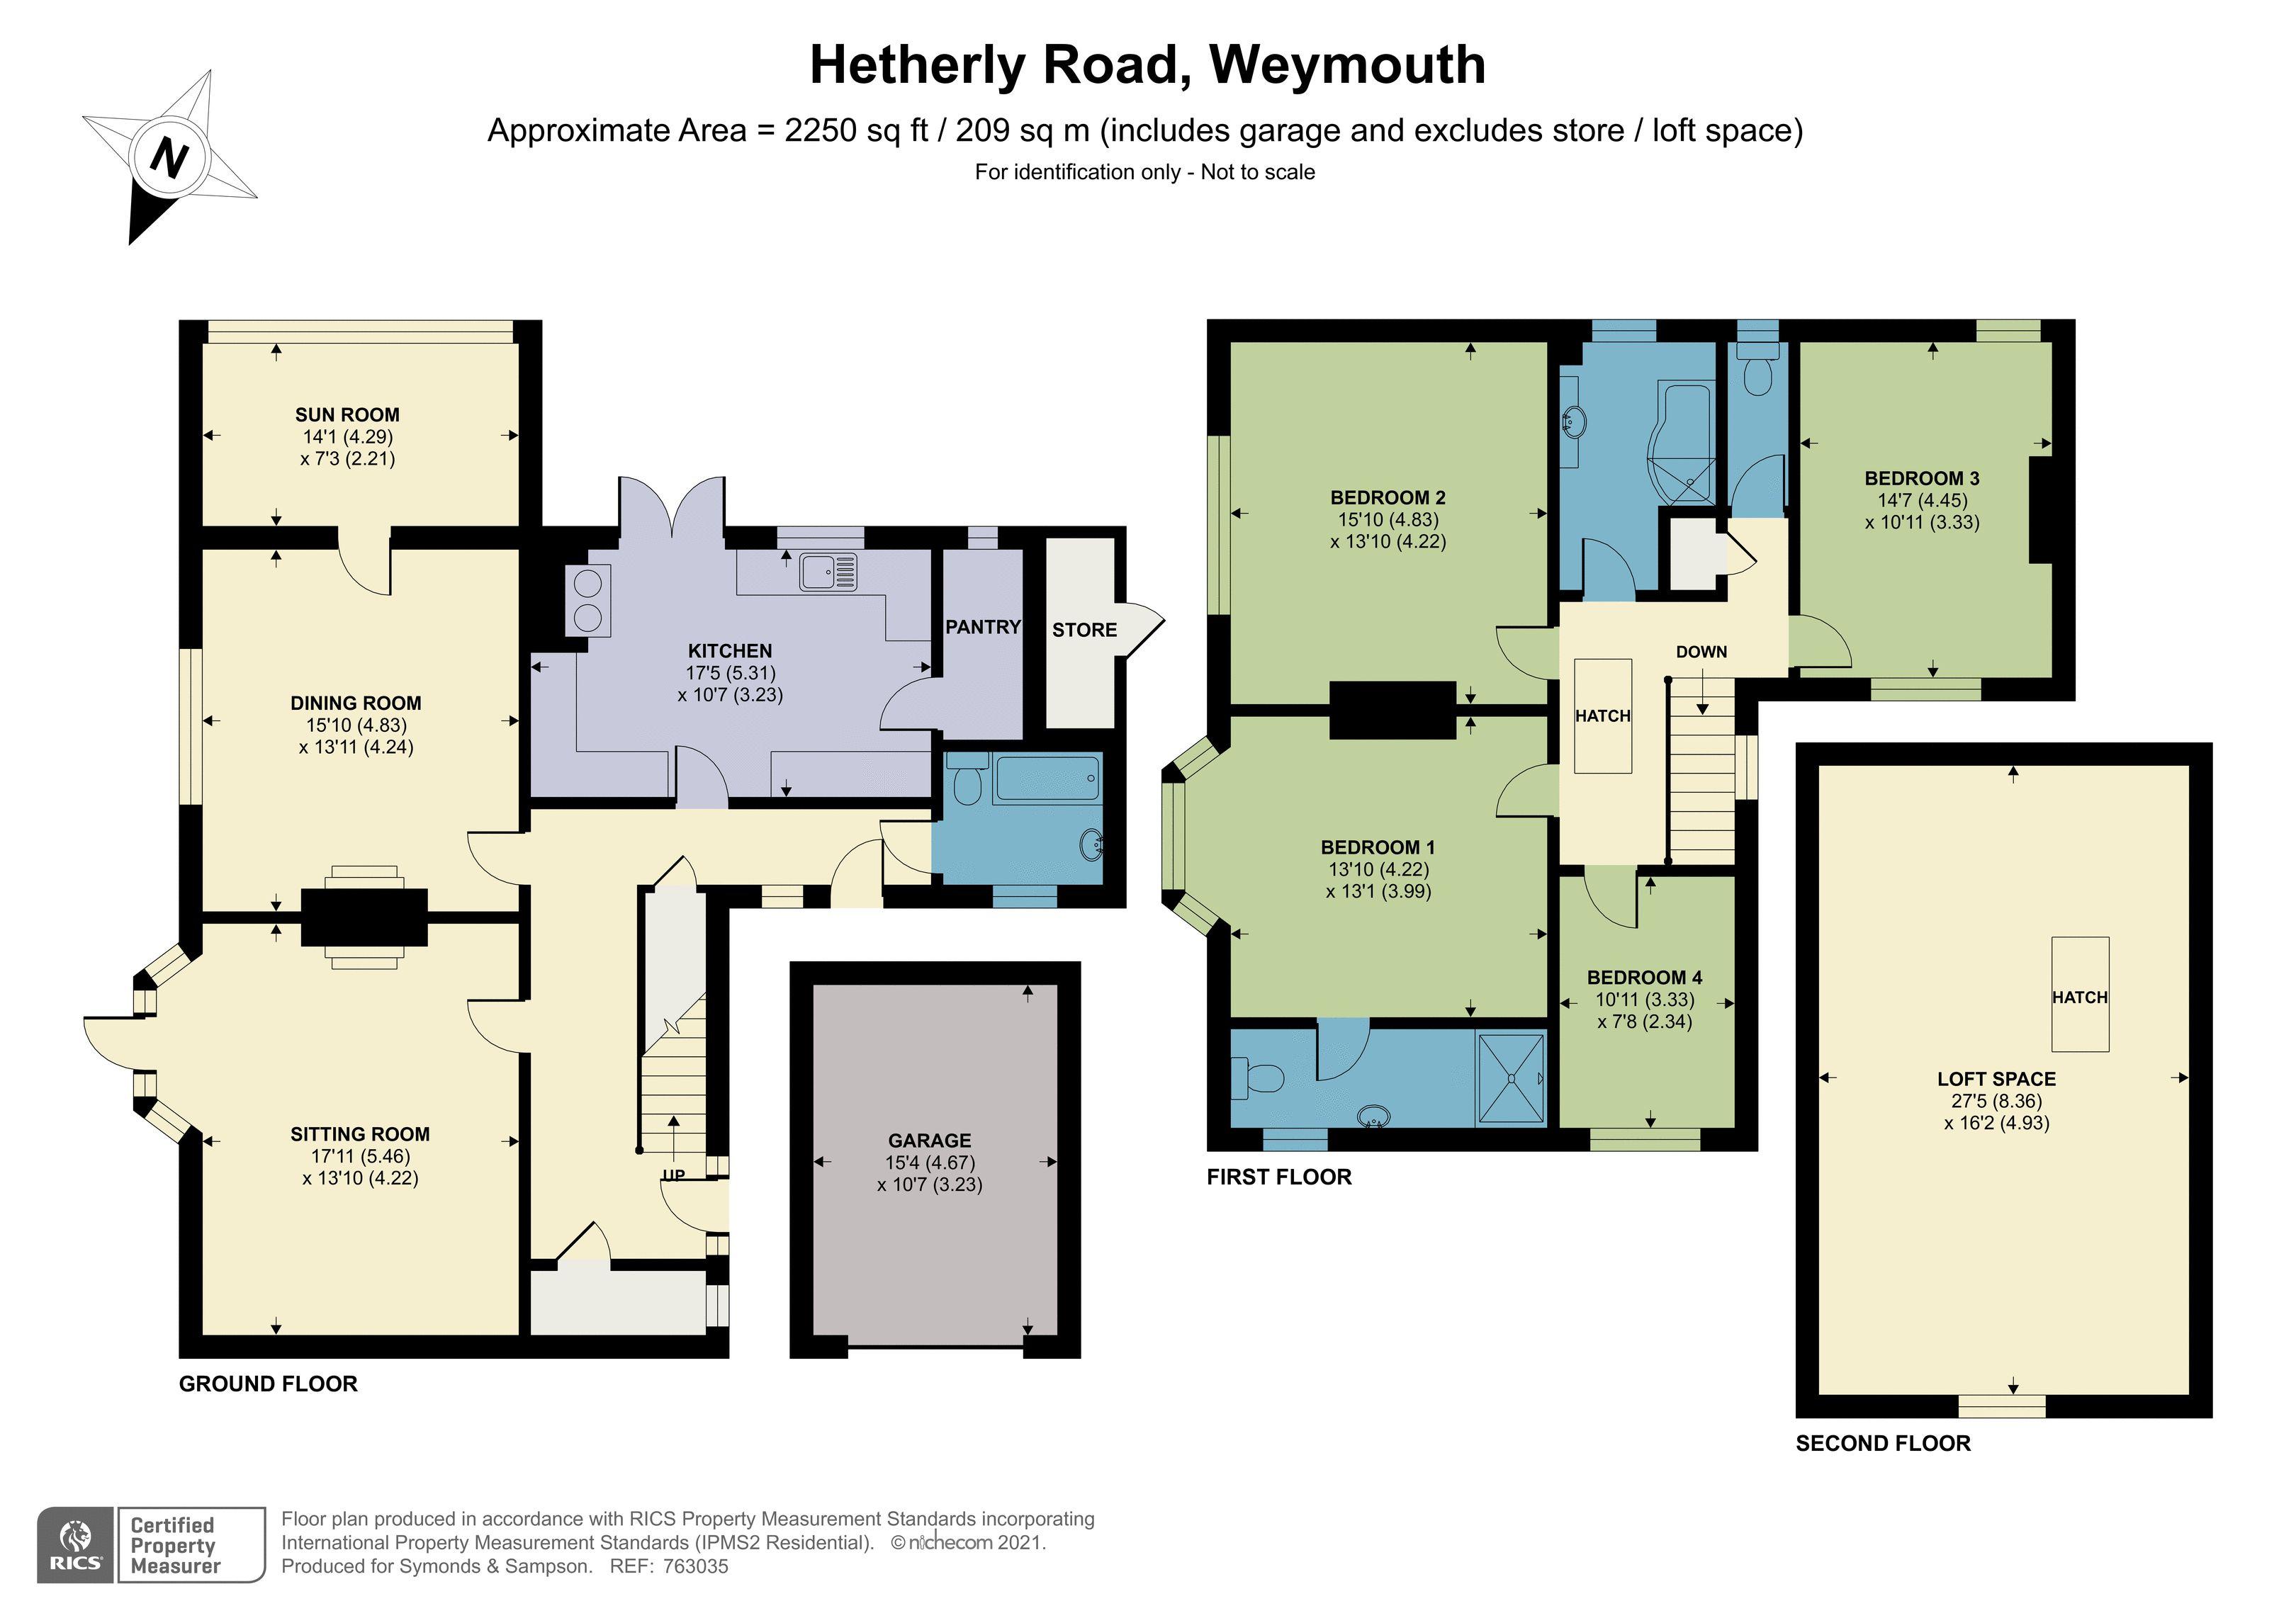 Floorplan - Hetherly Road, Weymouth, Dorset, DT3 5JN